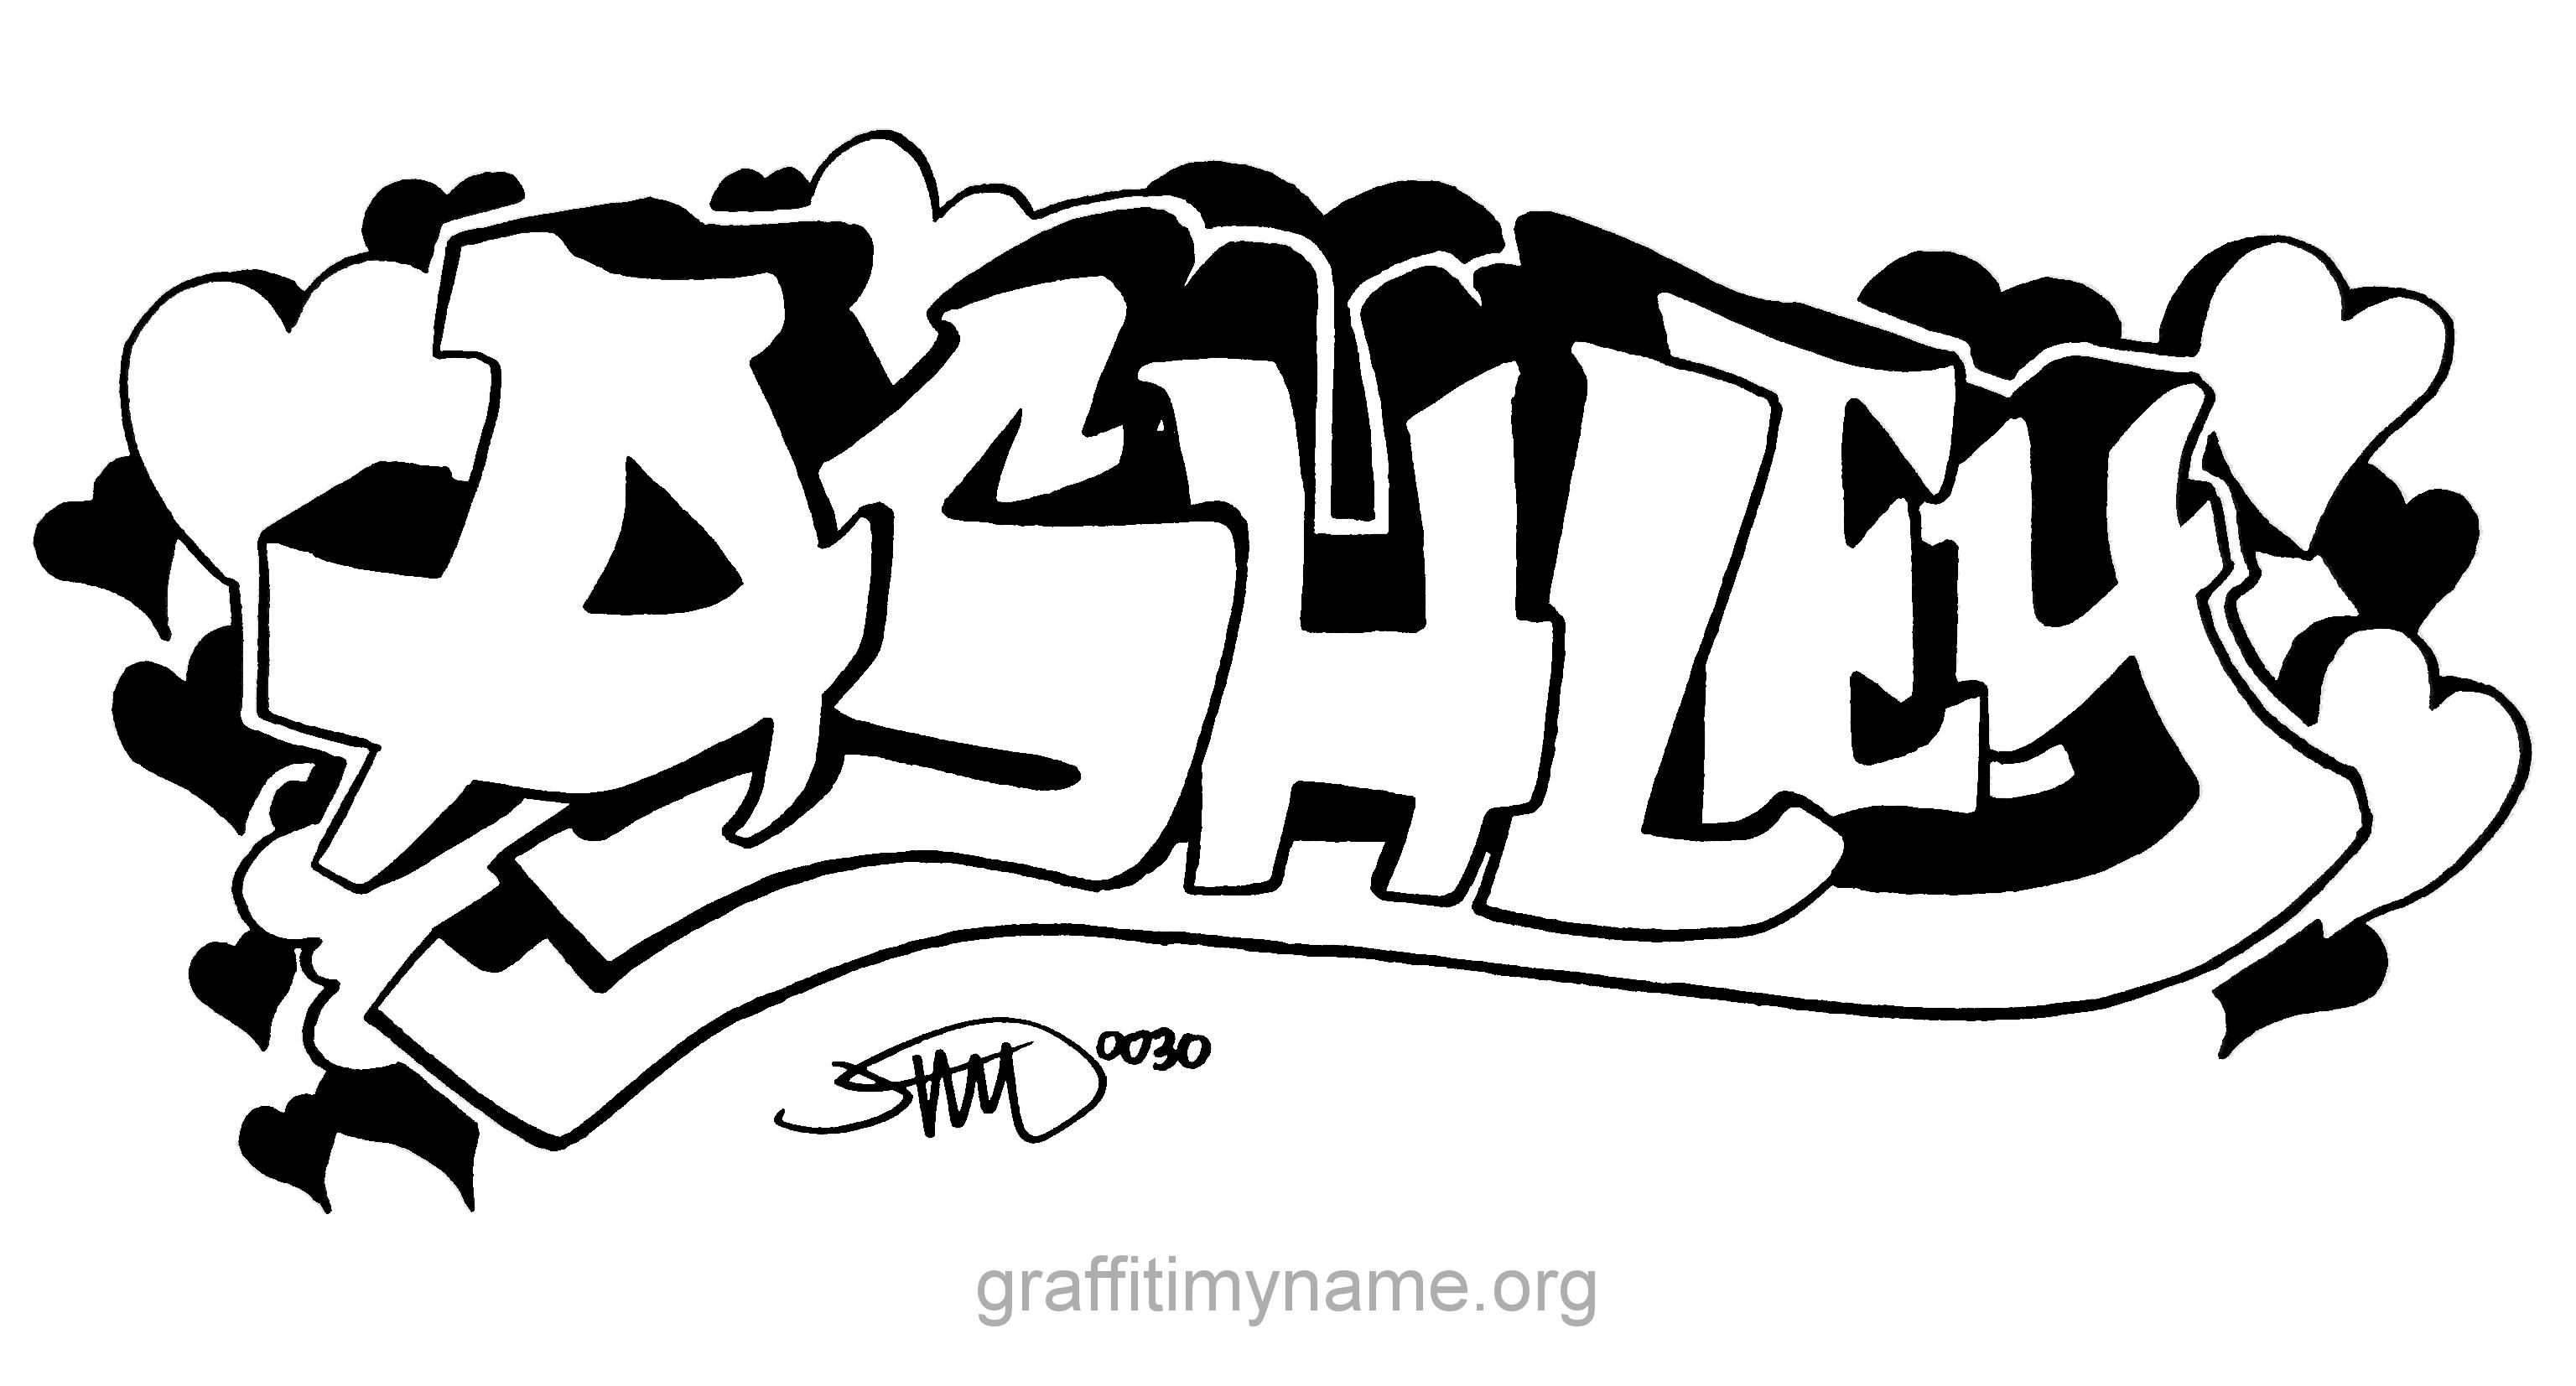 """ashley"" hand drawn graffiti style Ashley name, Name"